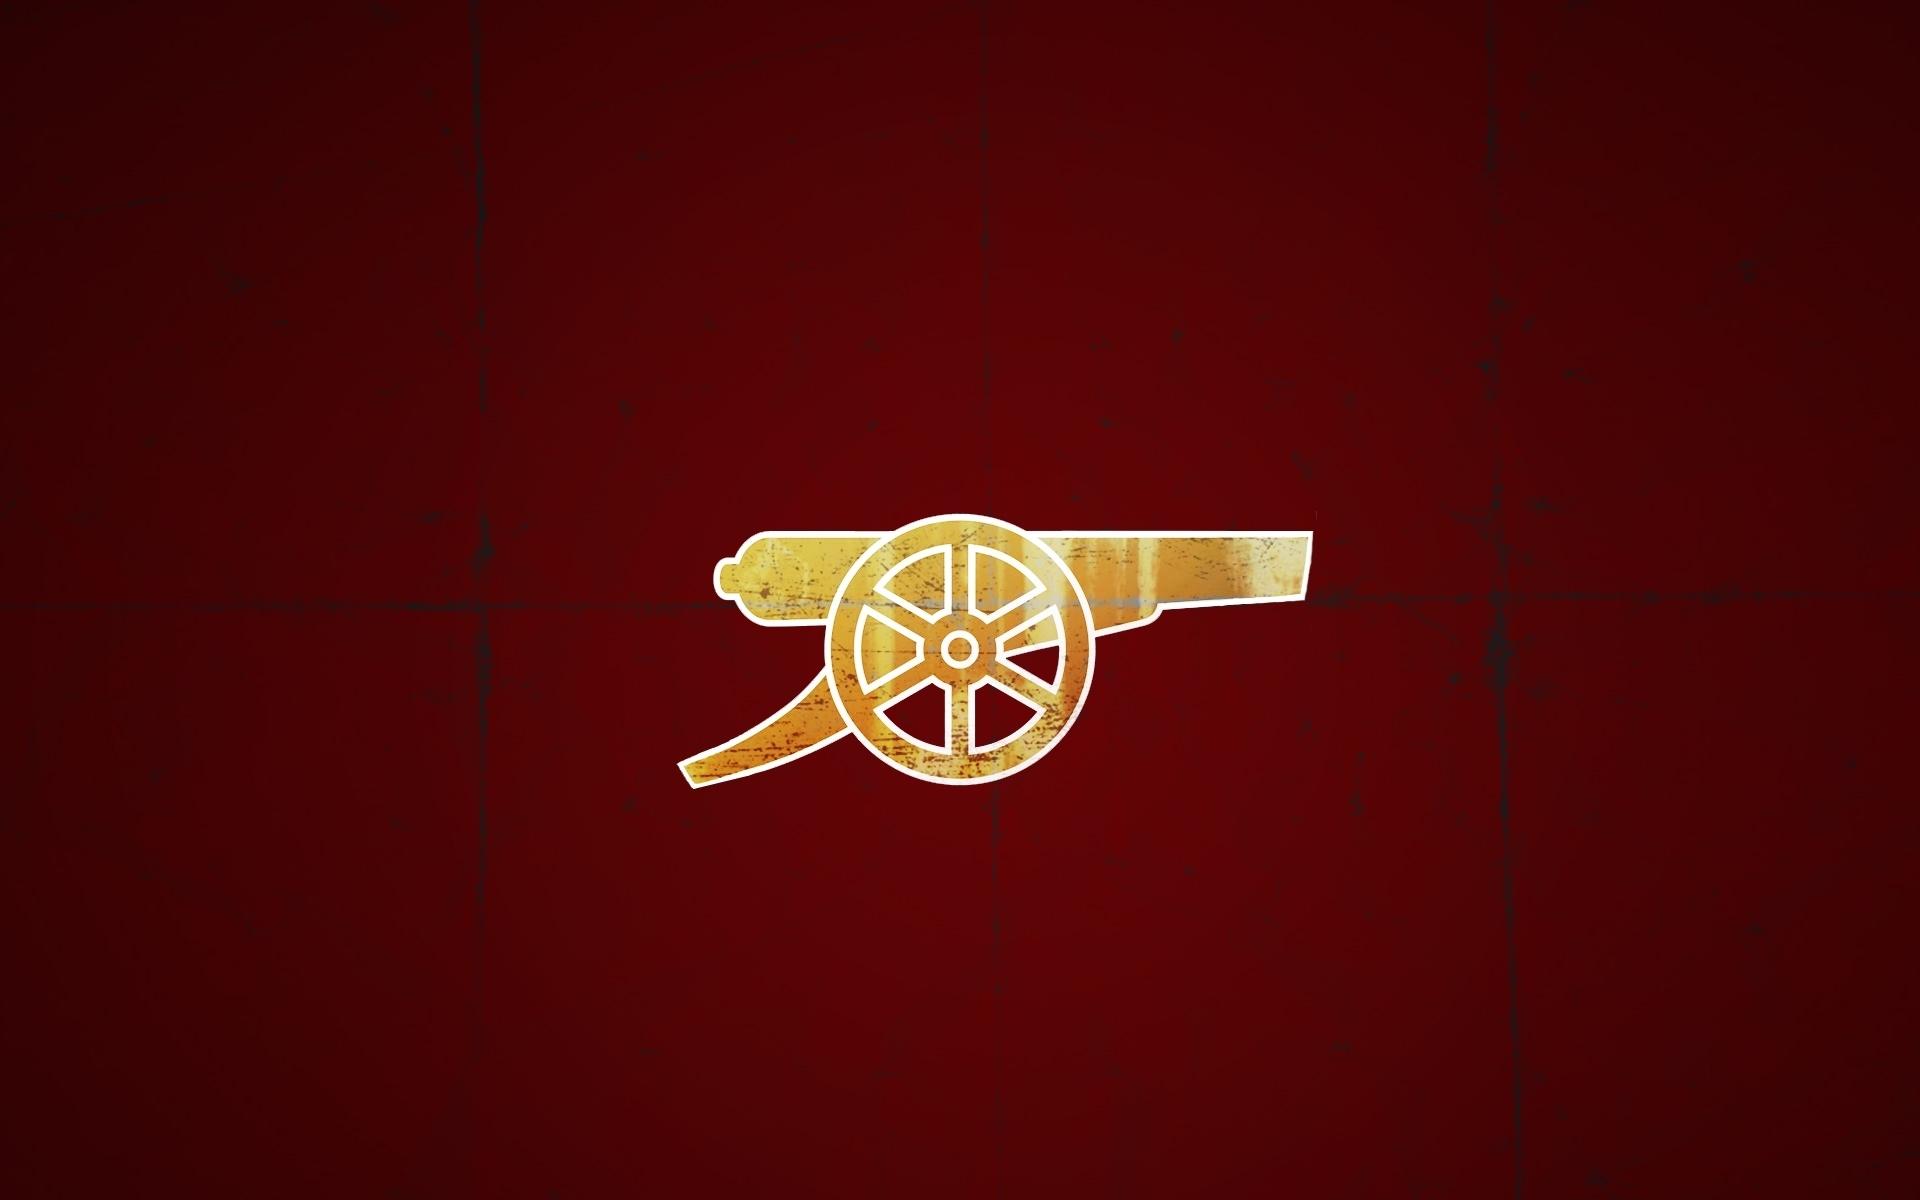 Arsenal Football Club logo wallpaper 18767 1920x1200